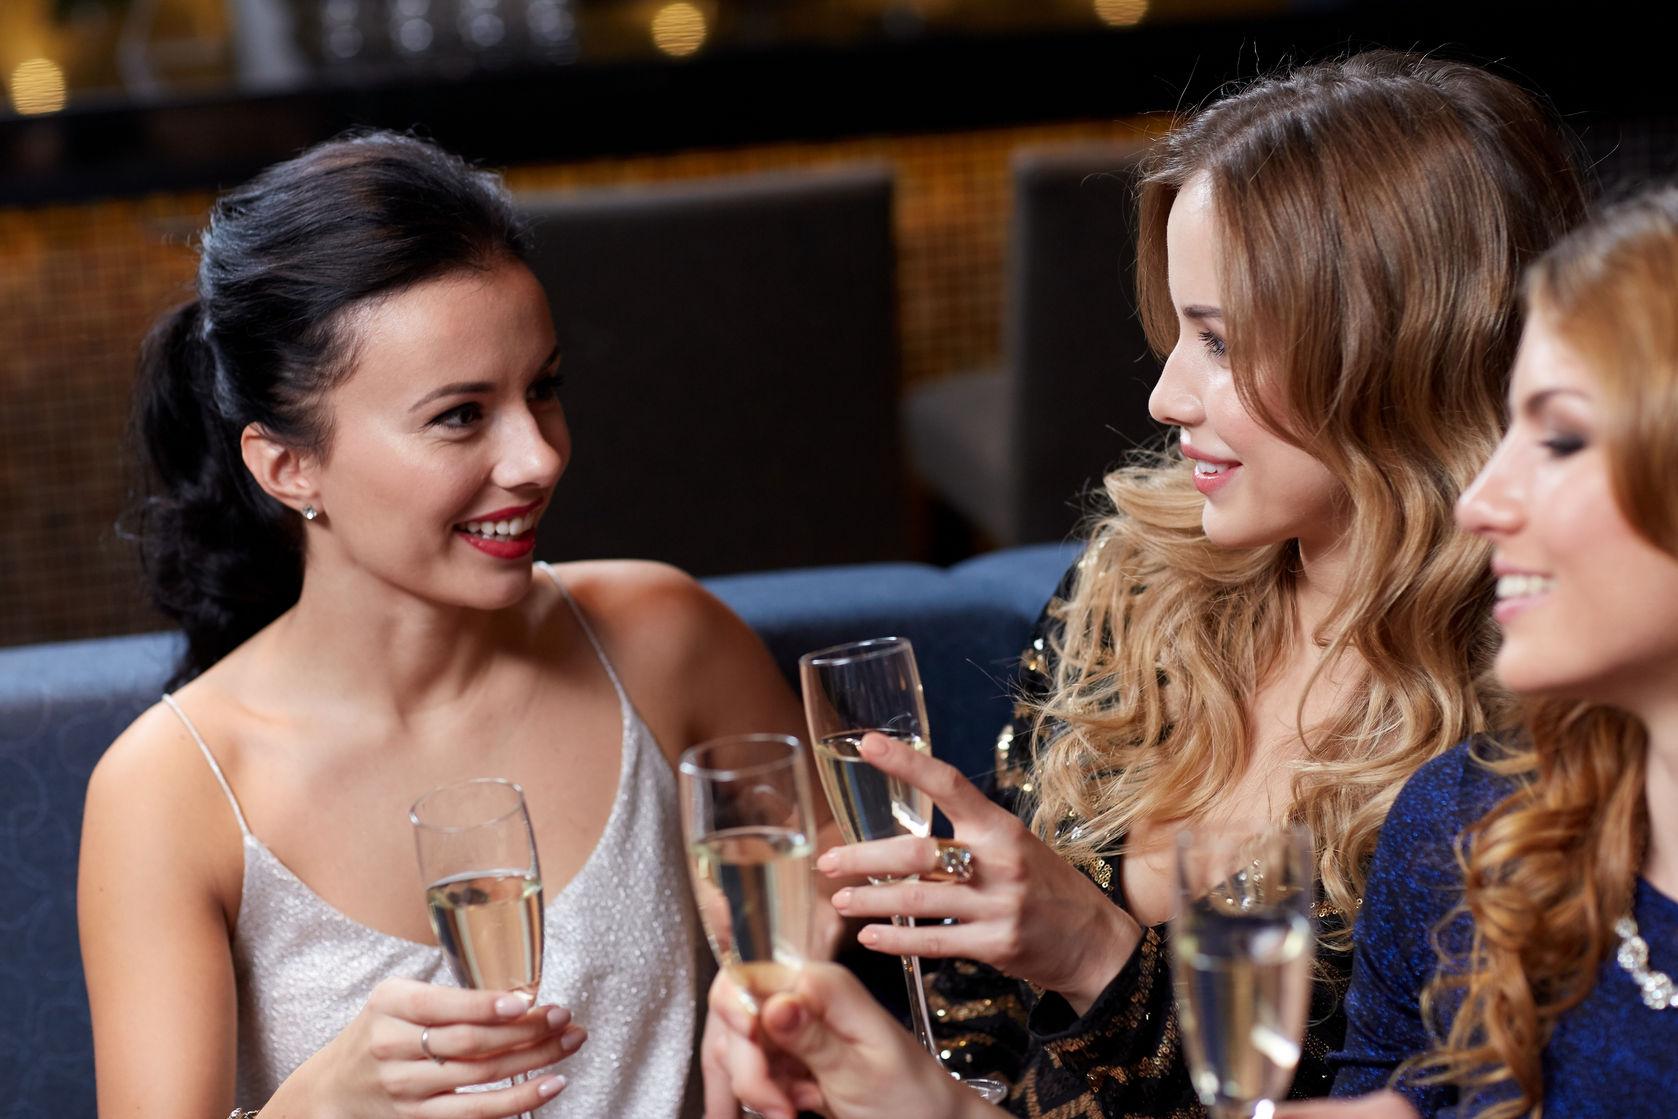 Vriendinnenuitje vriendinnendag vriendinnenweekend vriendinnen party homeparty spa wellness wellnessresort